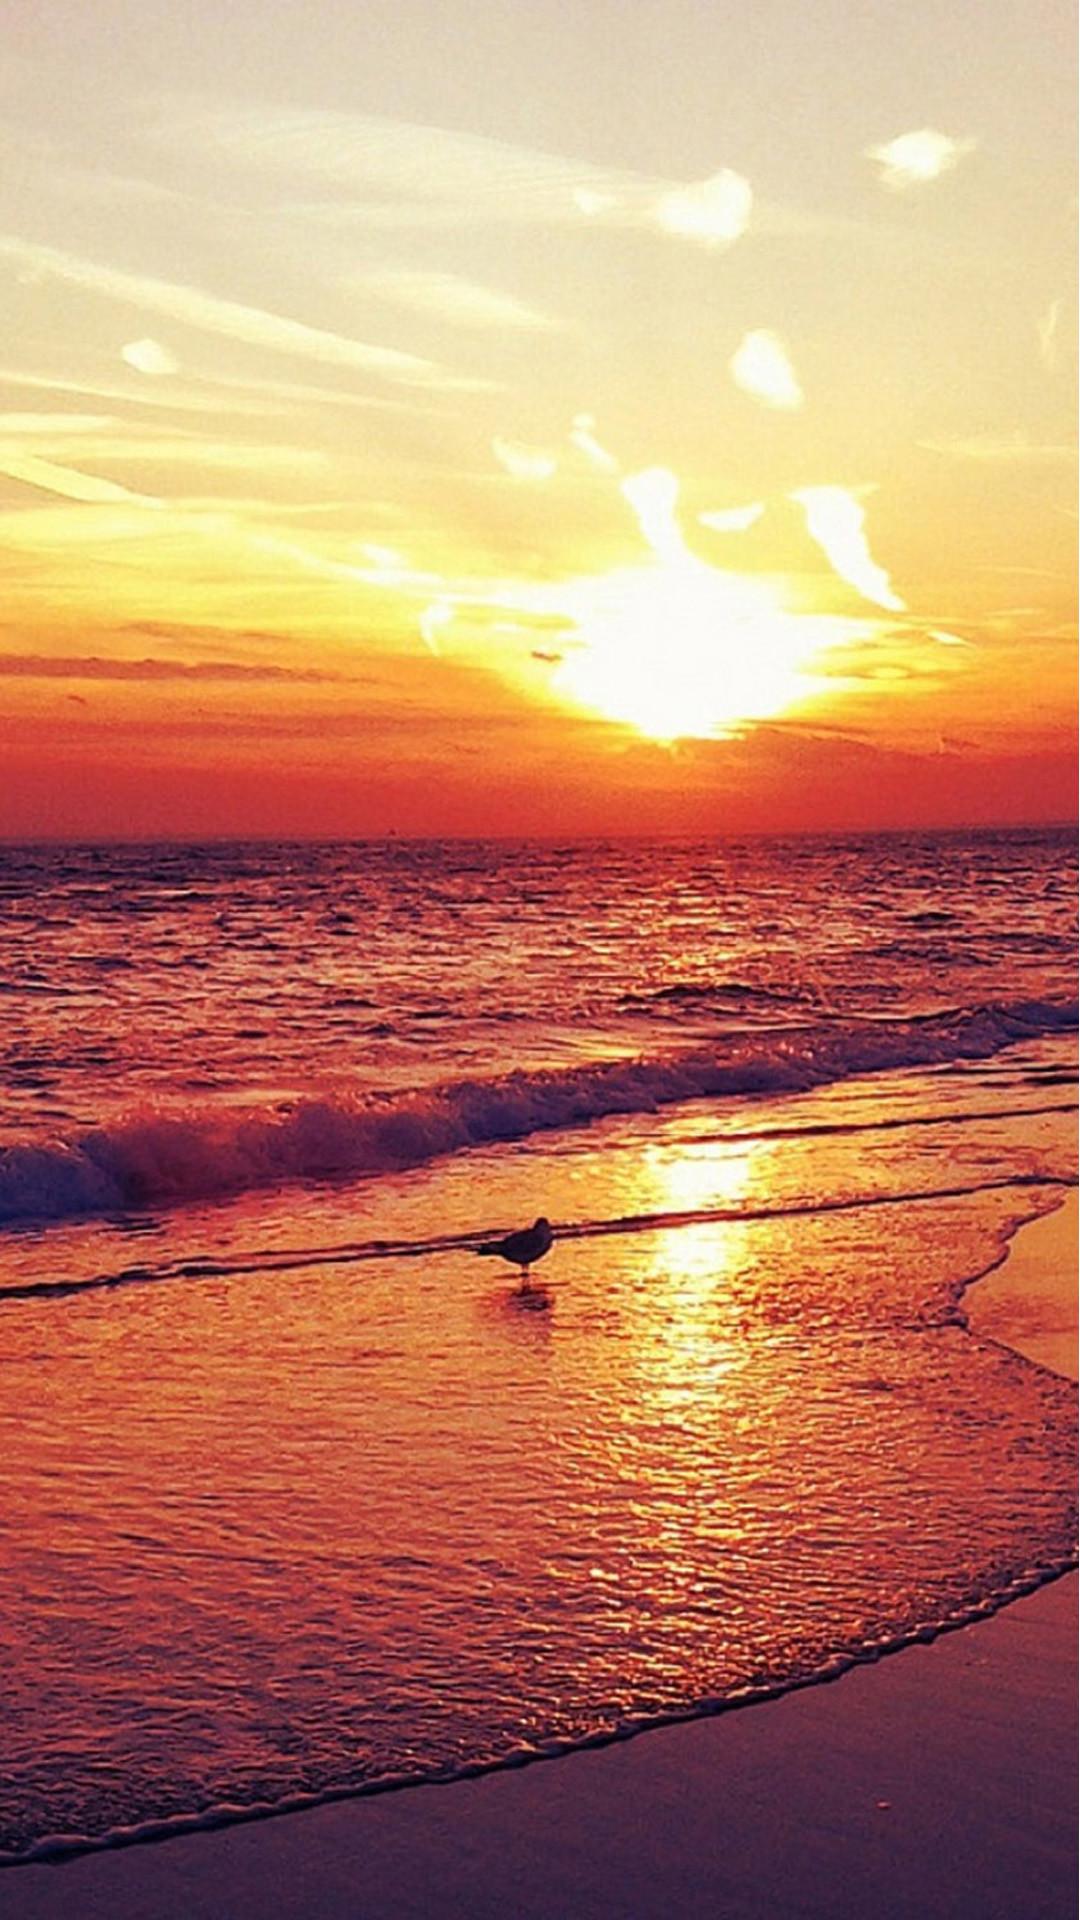 Nature-Sunset-Beach-Landscape-iphone-6-wallpaper-www.